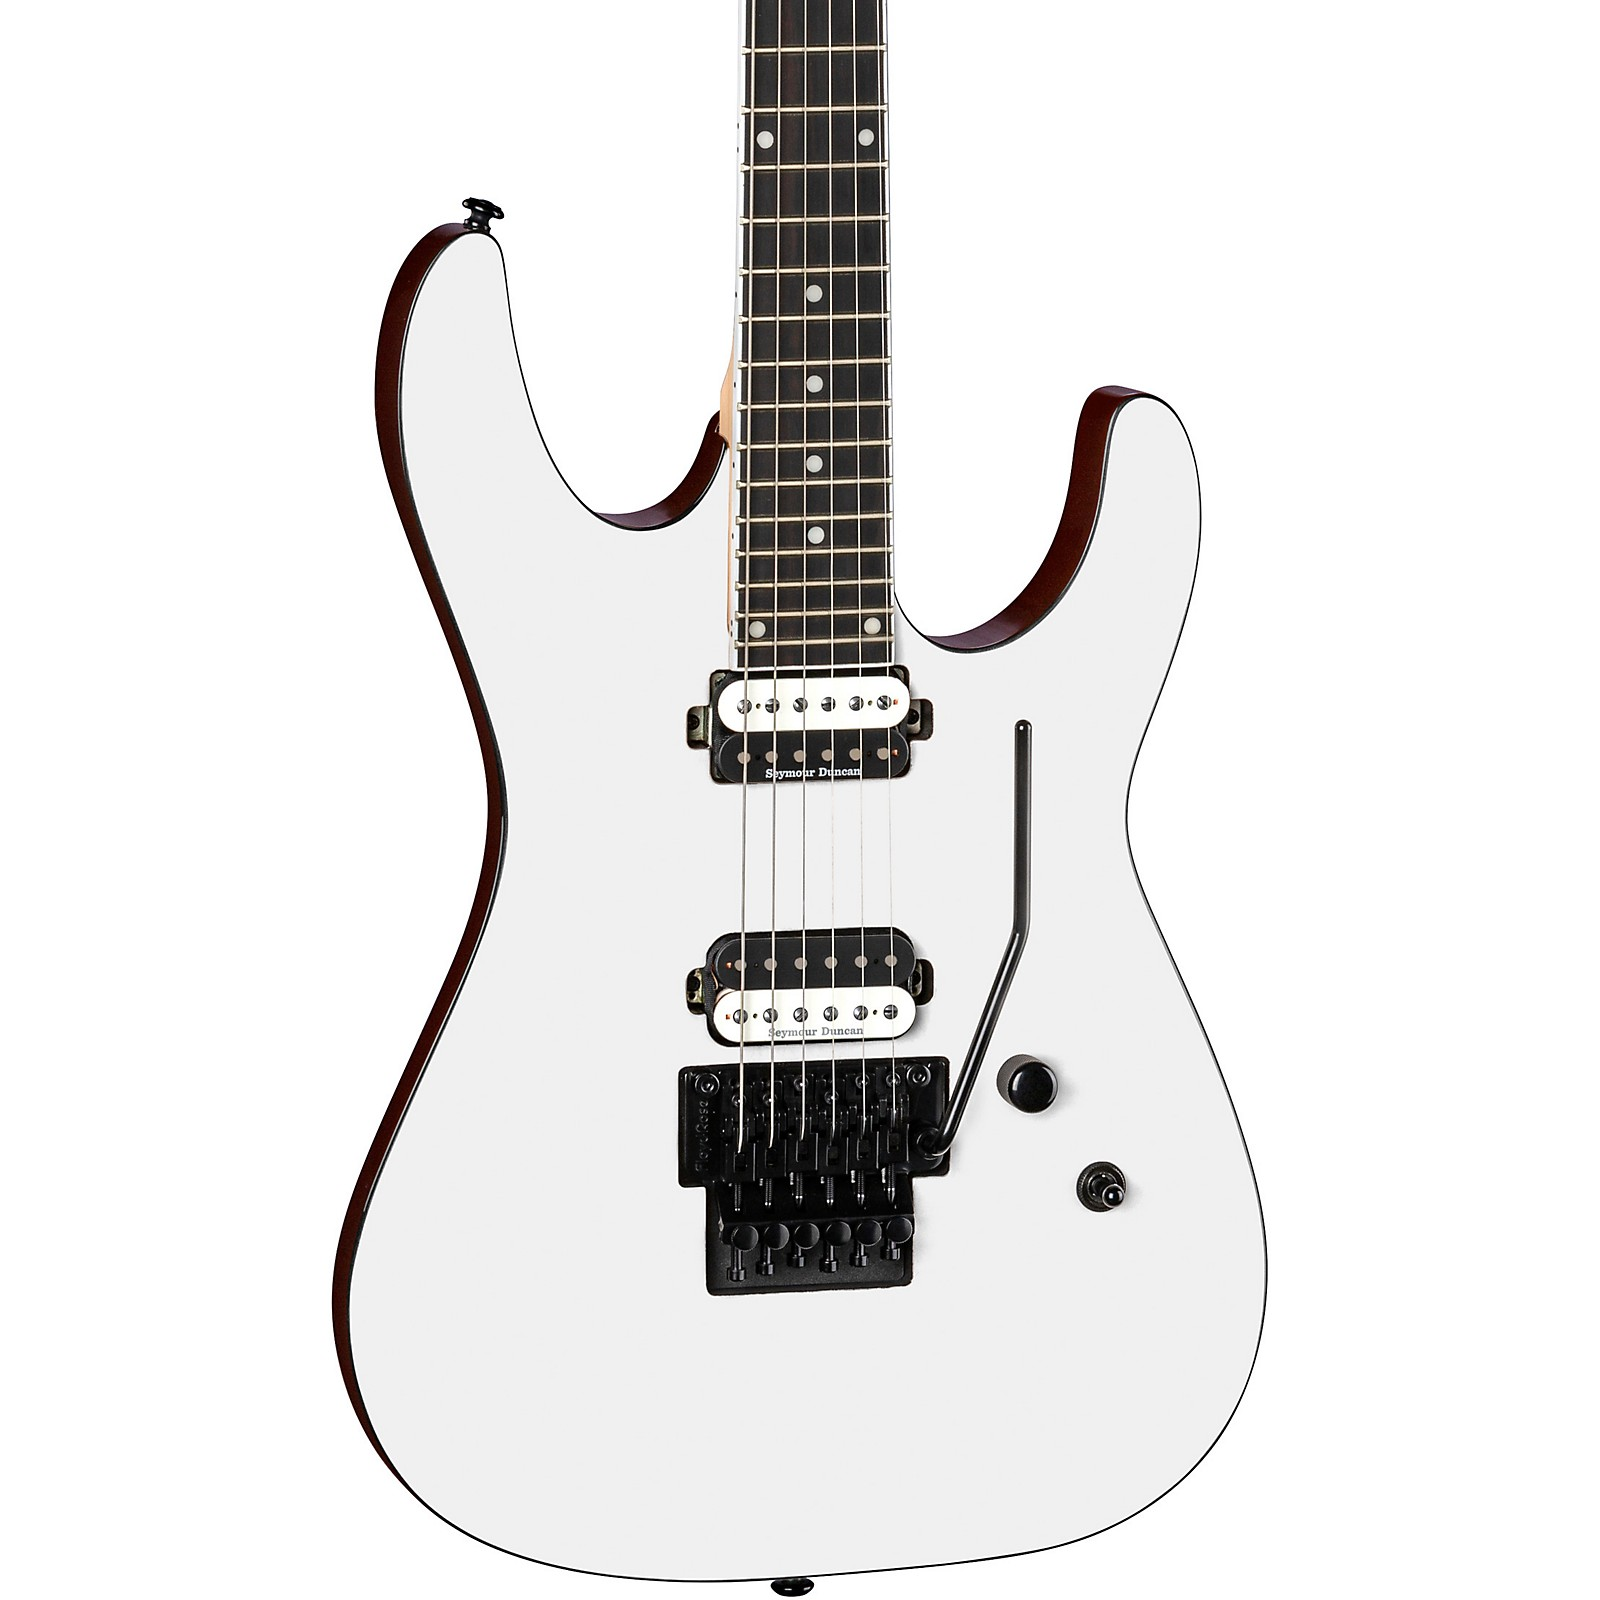 Dean Modern 24 Select with Floyd Rose Bridge Electric Guitar